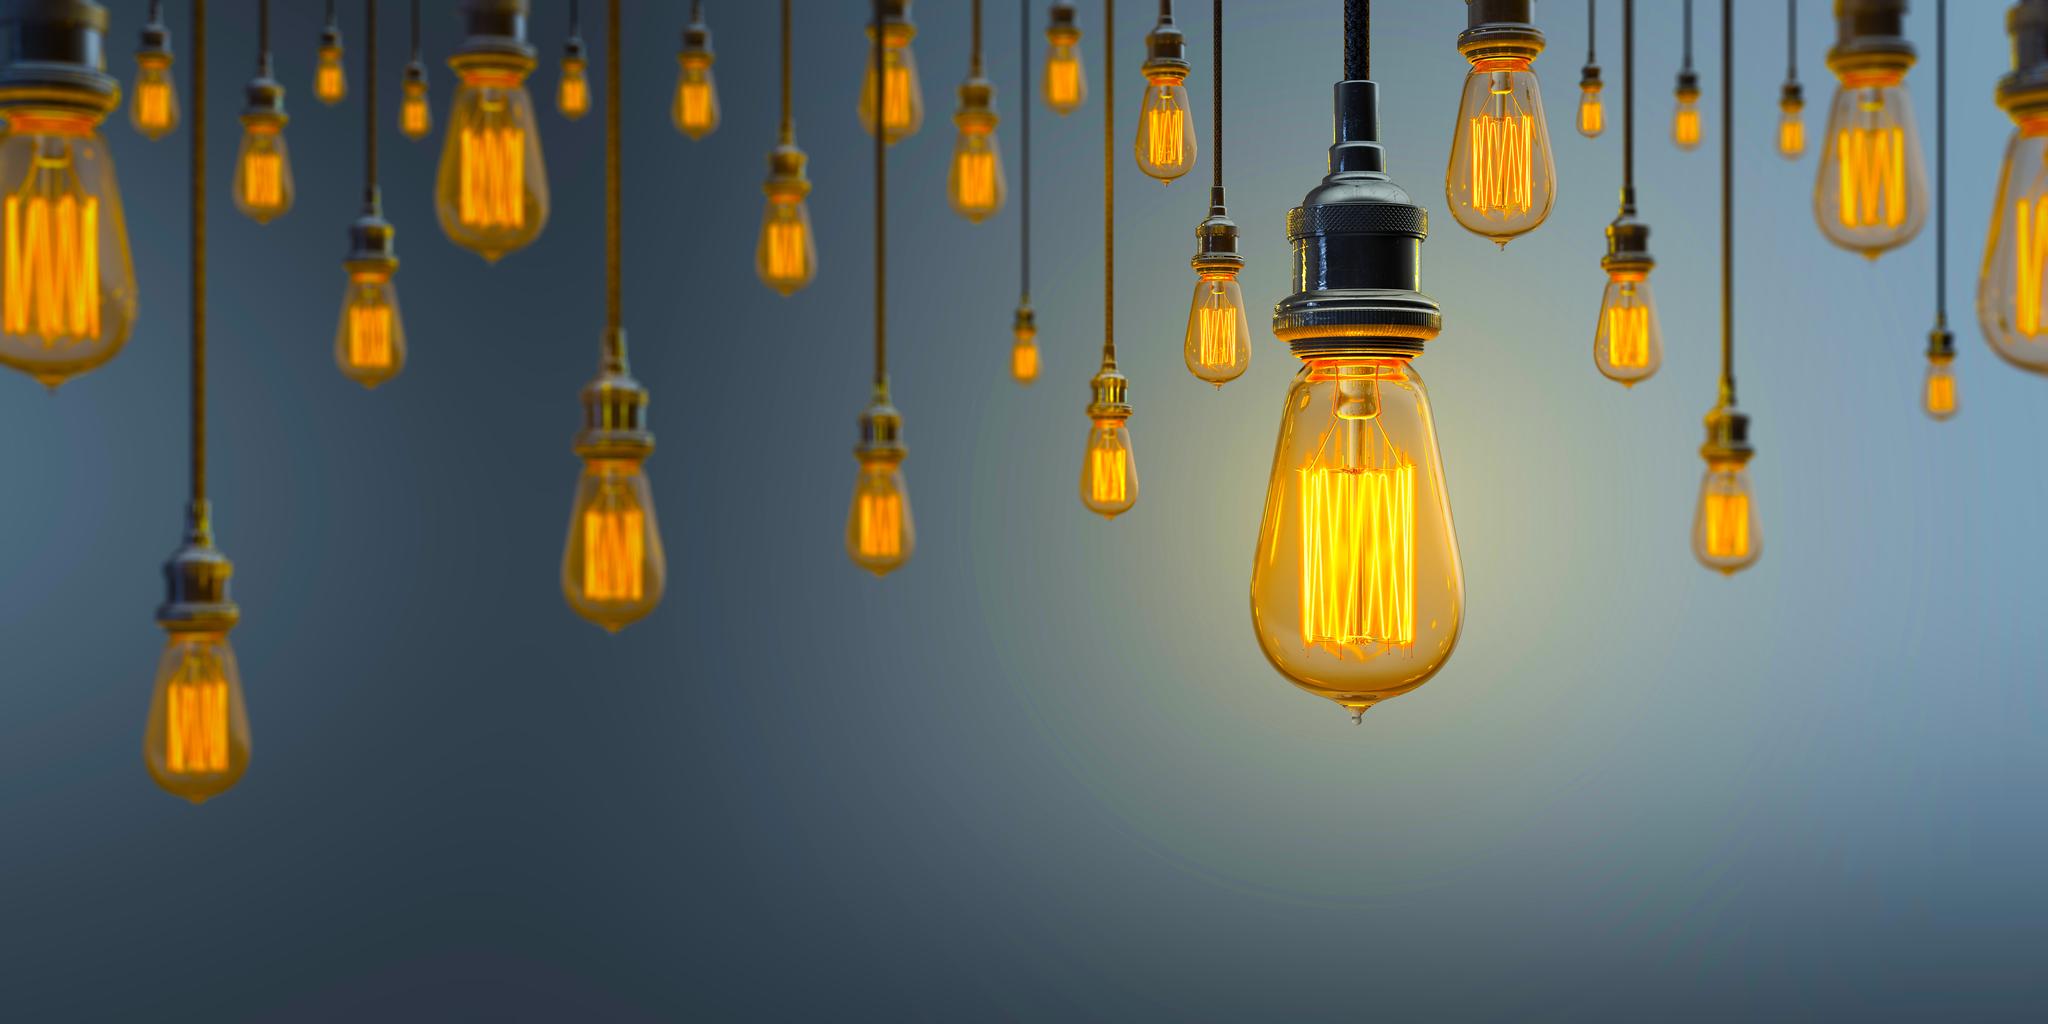 Hanging lit light bulbs